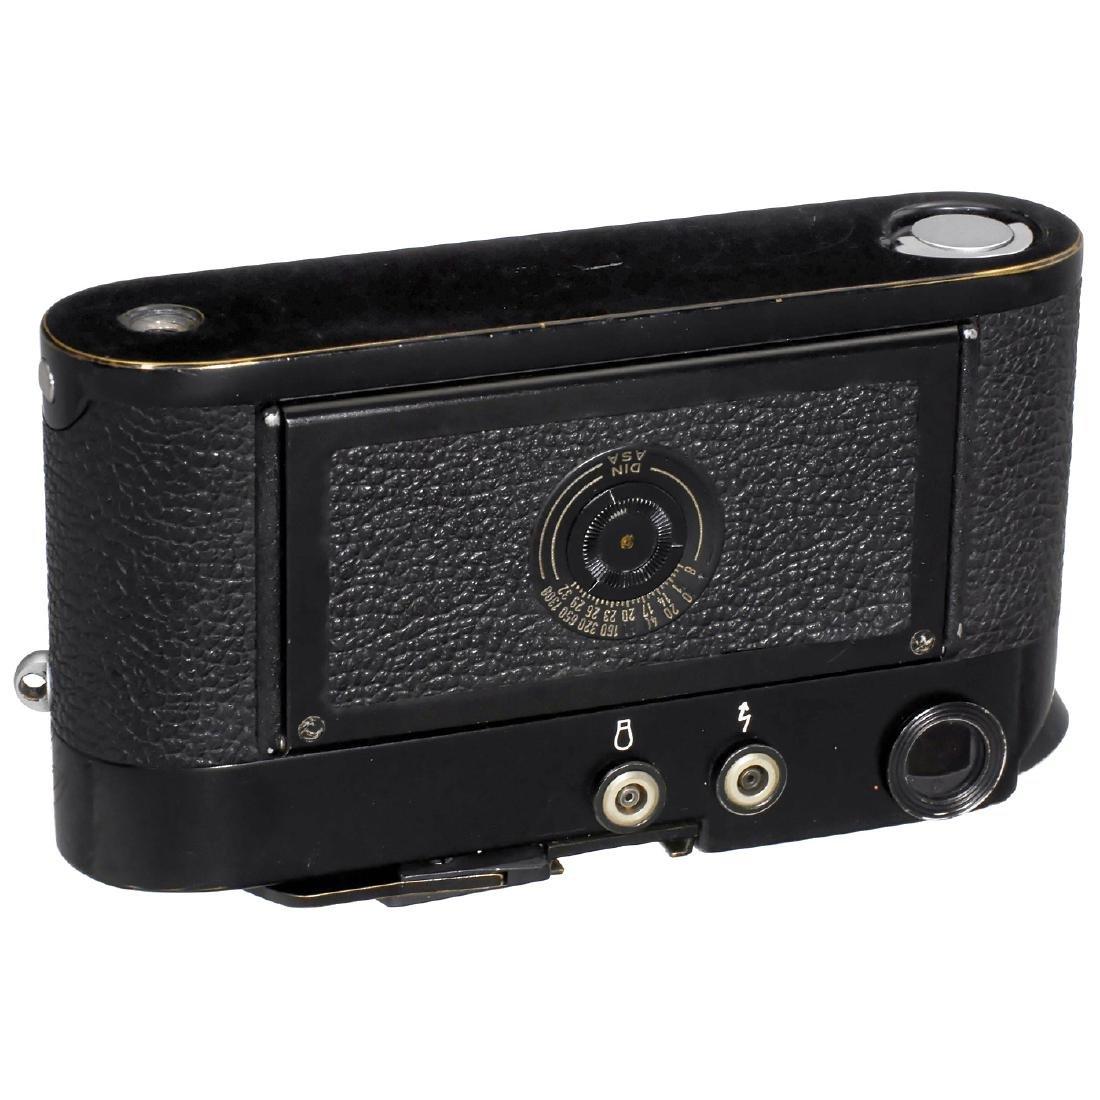 Leica M4 Body (Black Paint), 1969 - 2